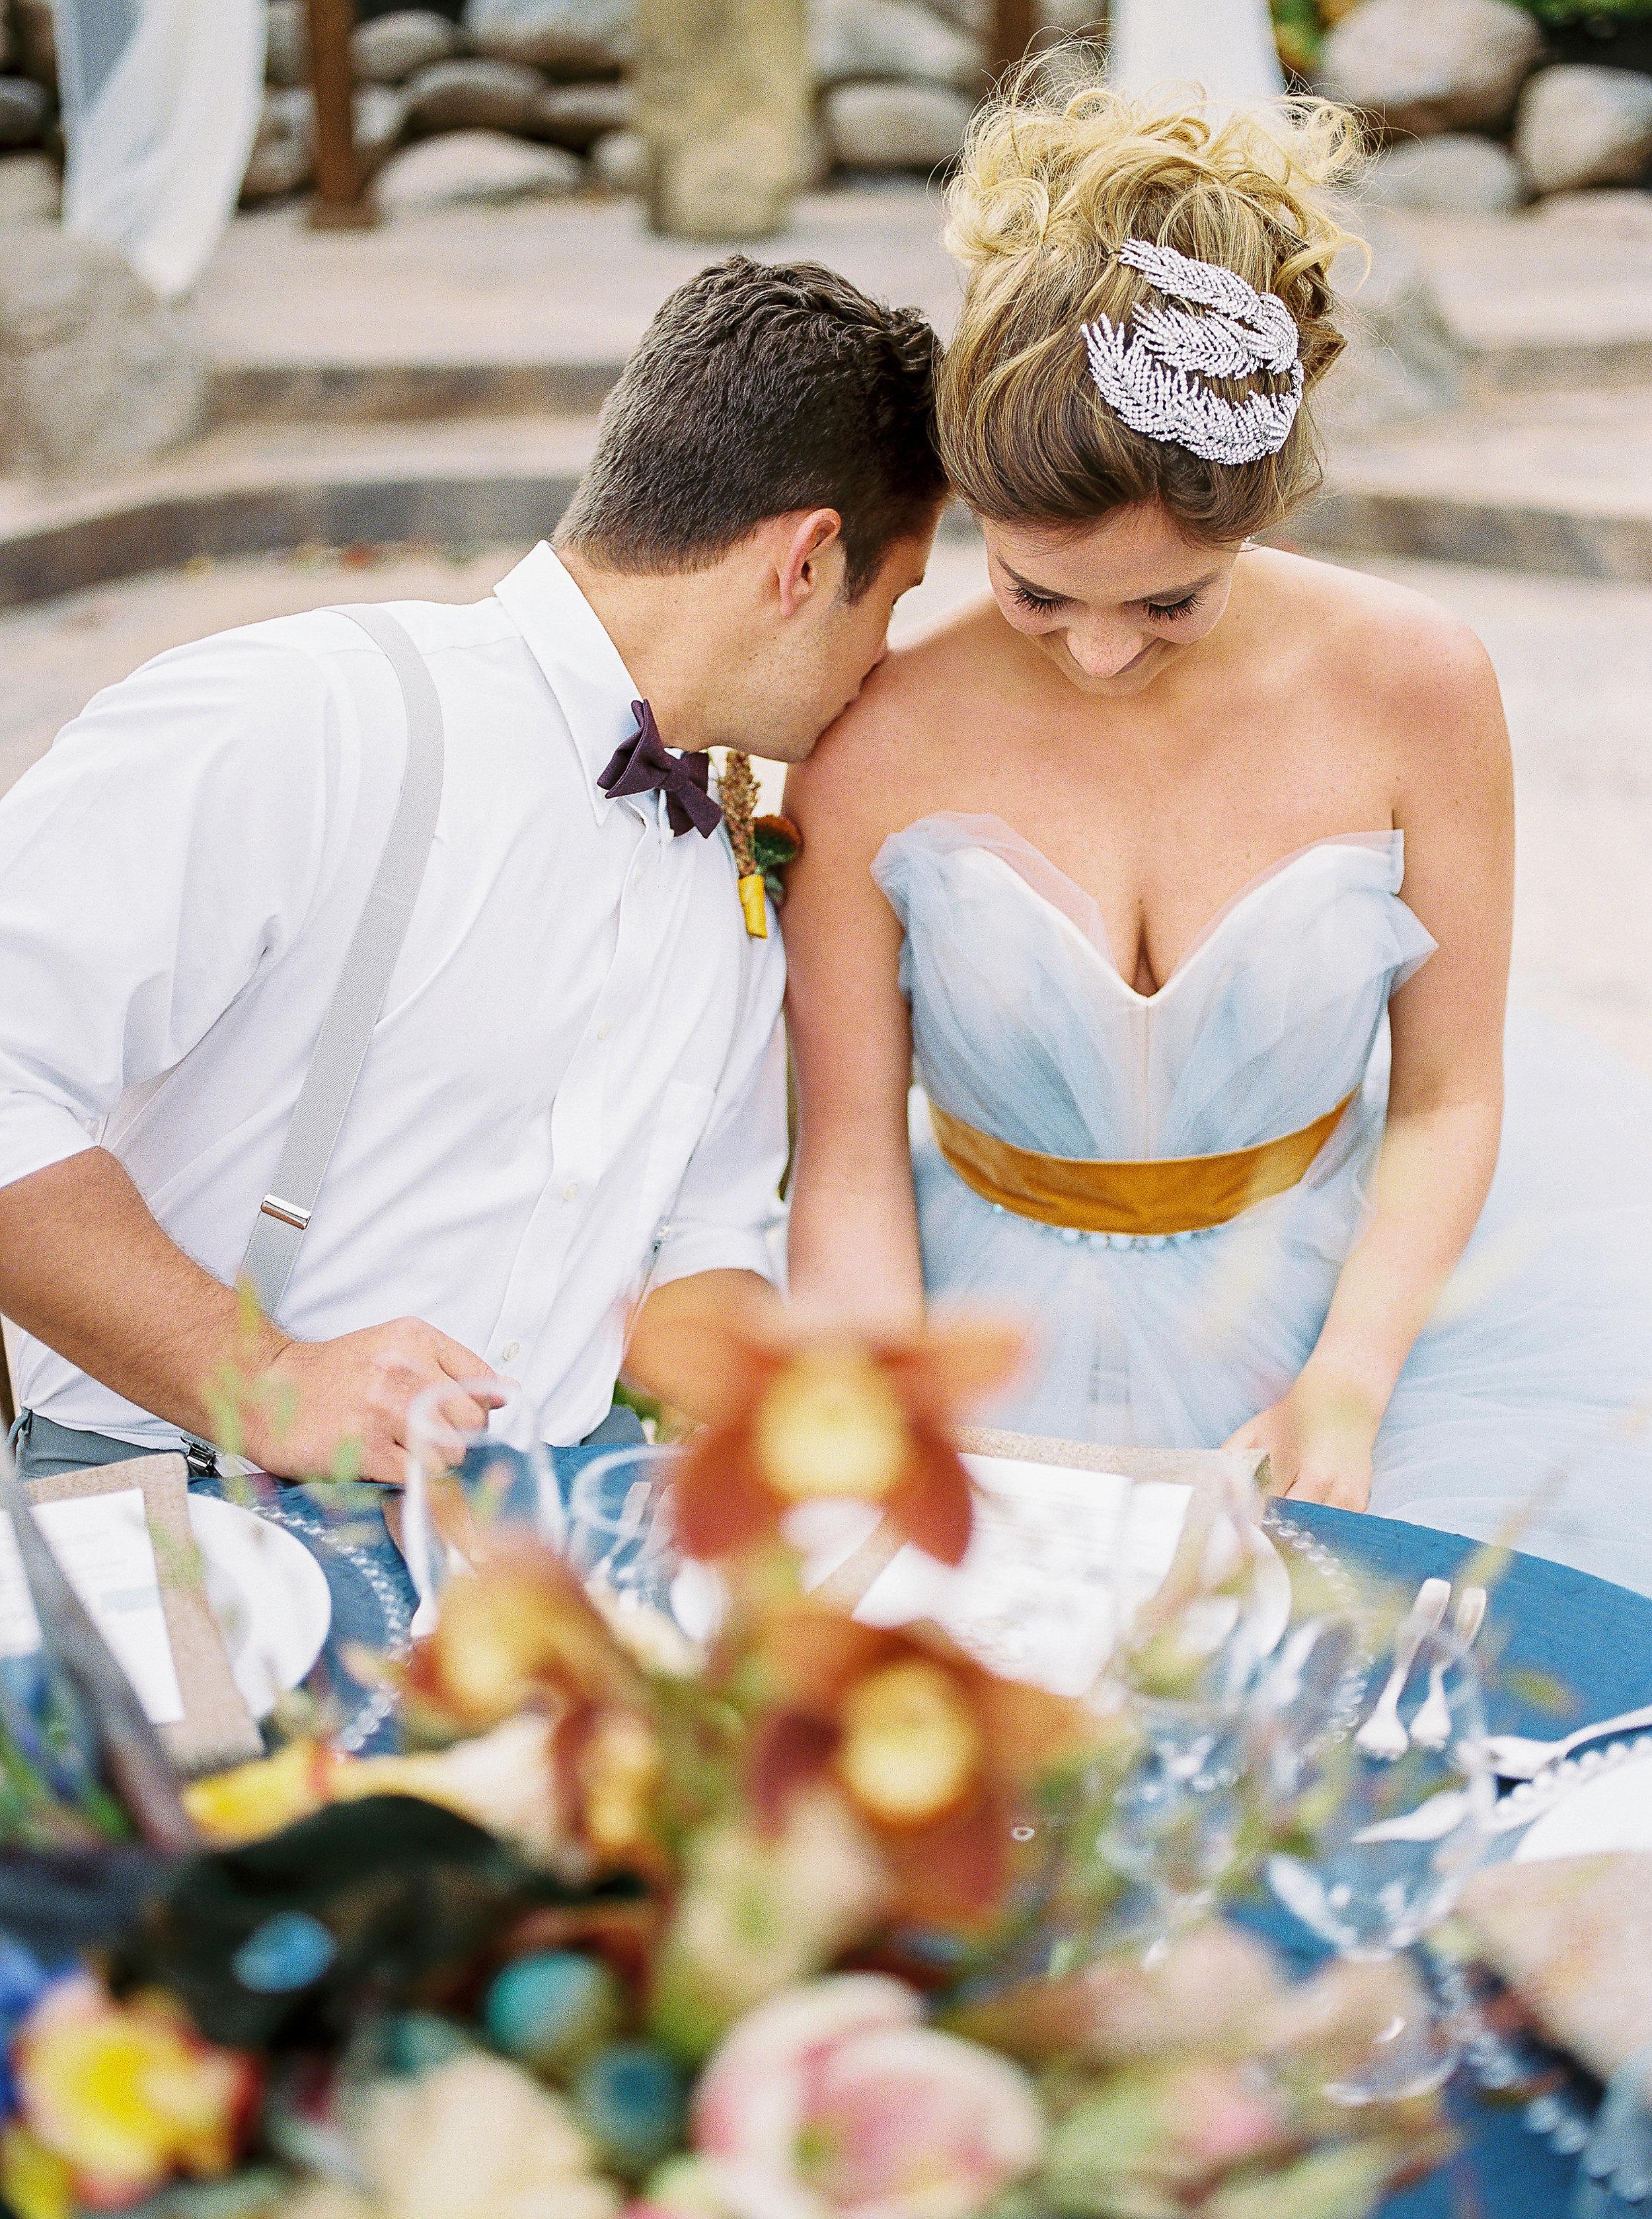 Alexandra-Elise-Photography-Ali-Reed-Film-Wedding-Photographer-Deerfield-Country-Club-009.jpg